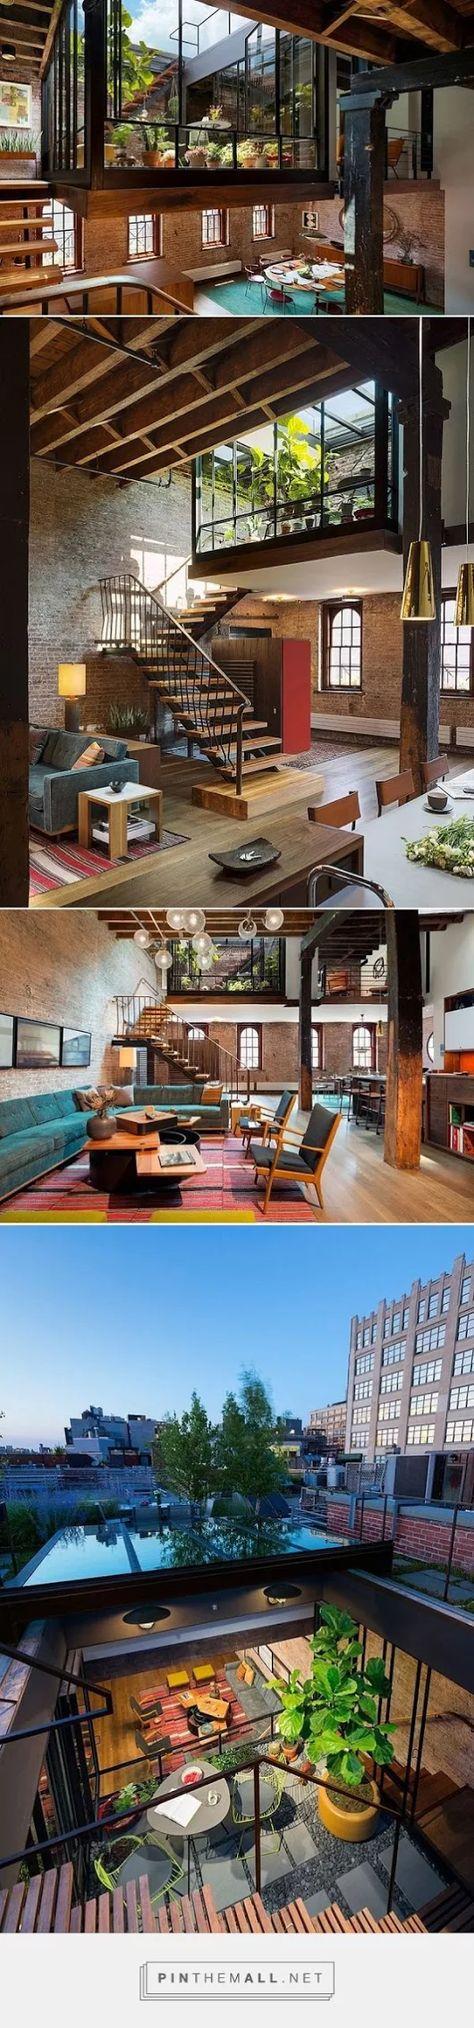 103 best Furnichur images on Pinterest | Future house, Home ideas ...